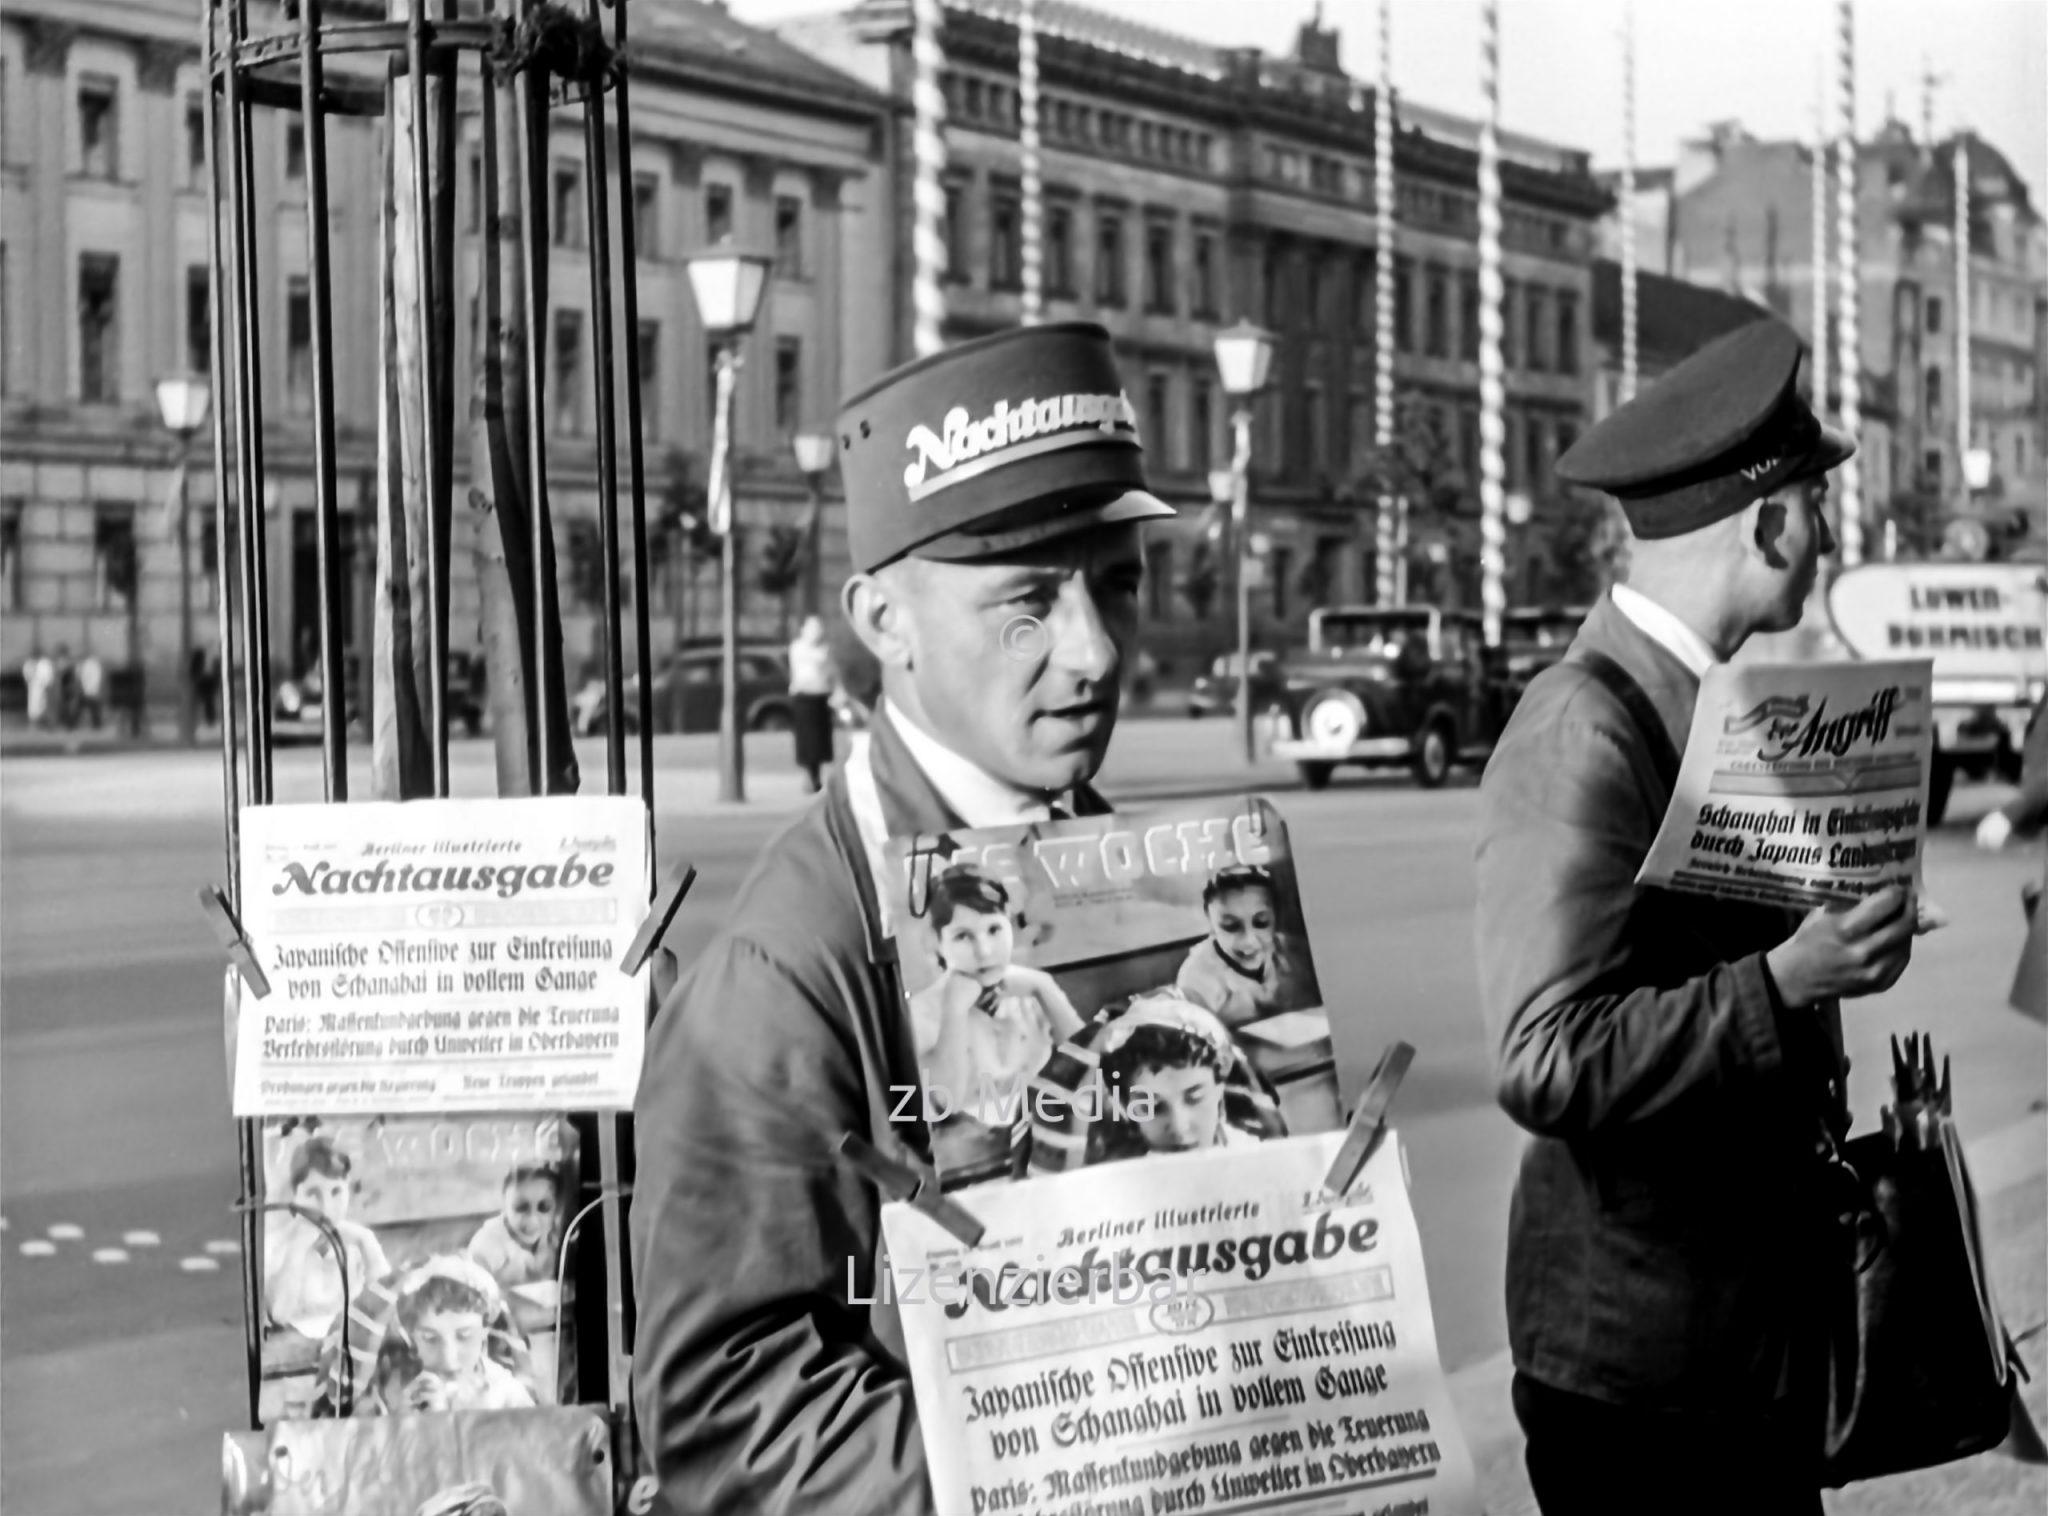 Zeitungsverkäufer in Berlin 1937